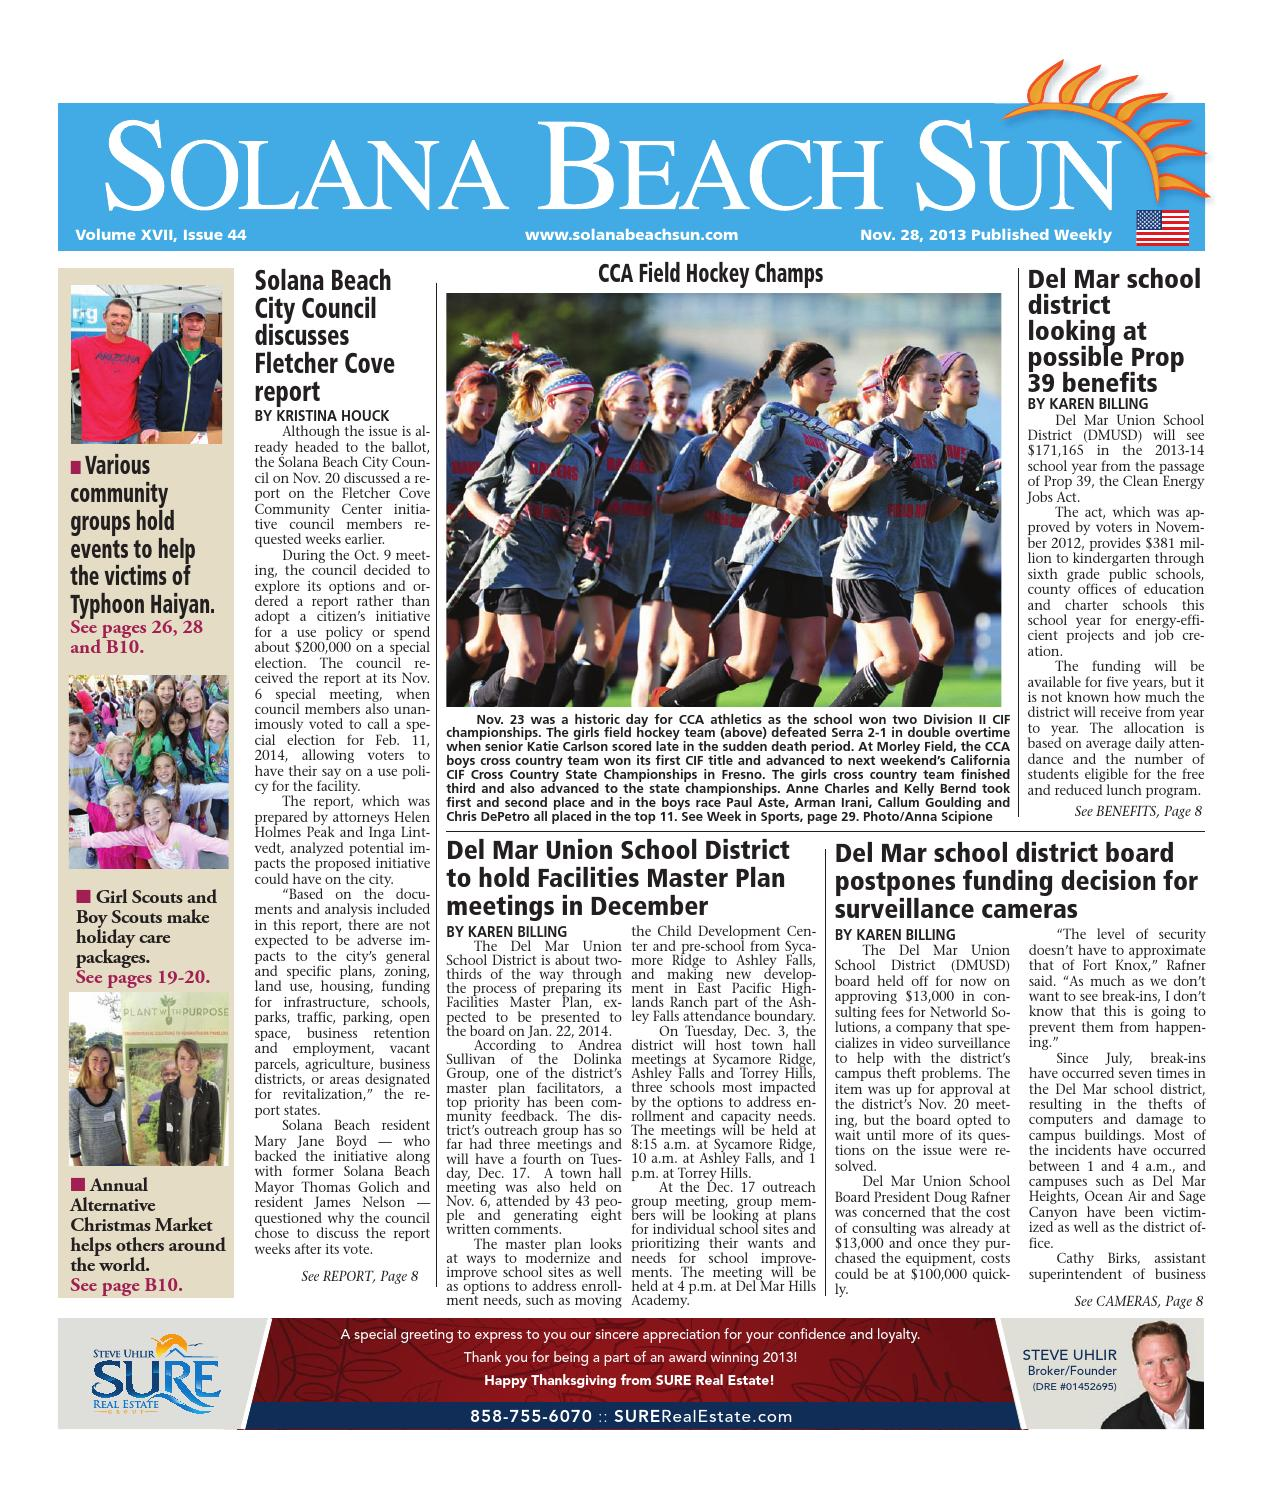 Solana Beach Sun 11 28 13 By Mainstreet Media Issuu